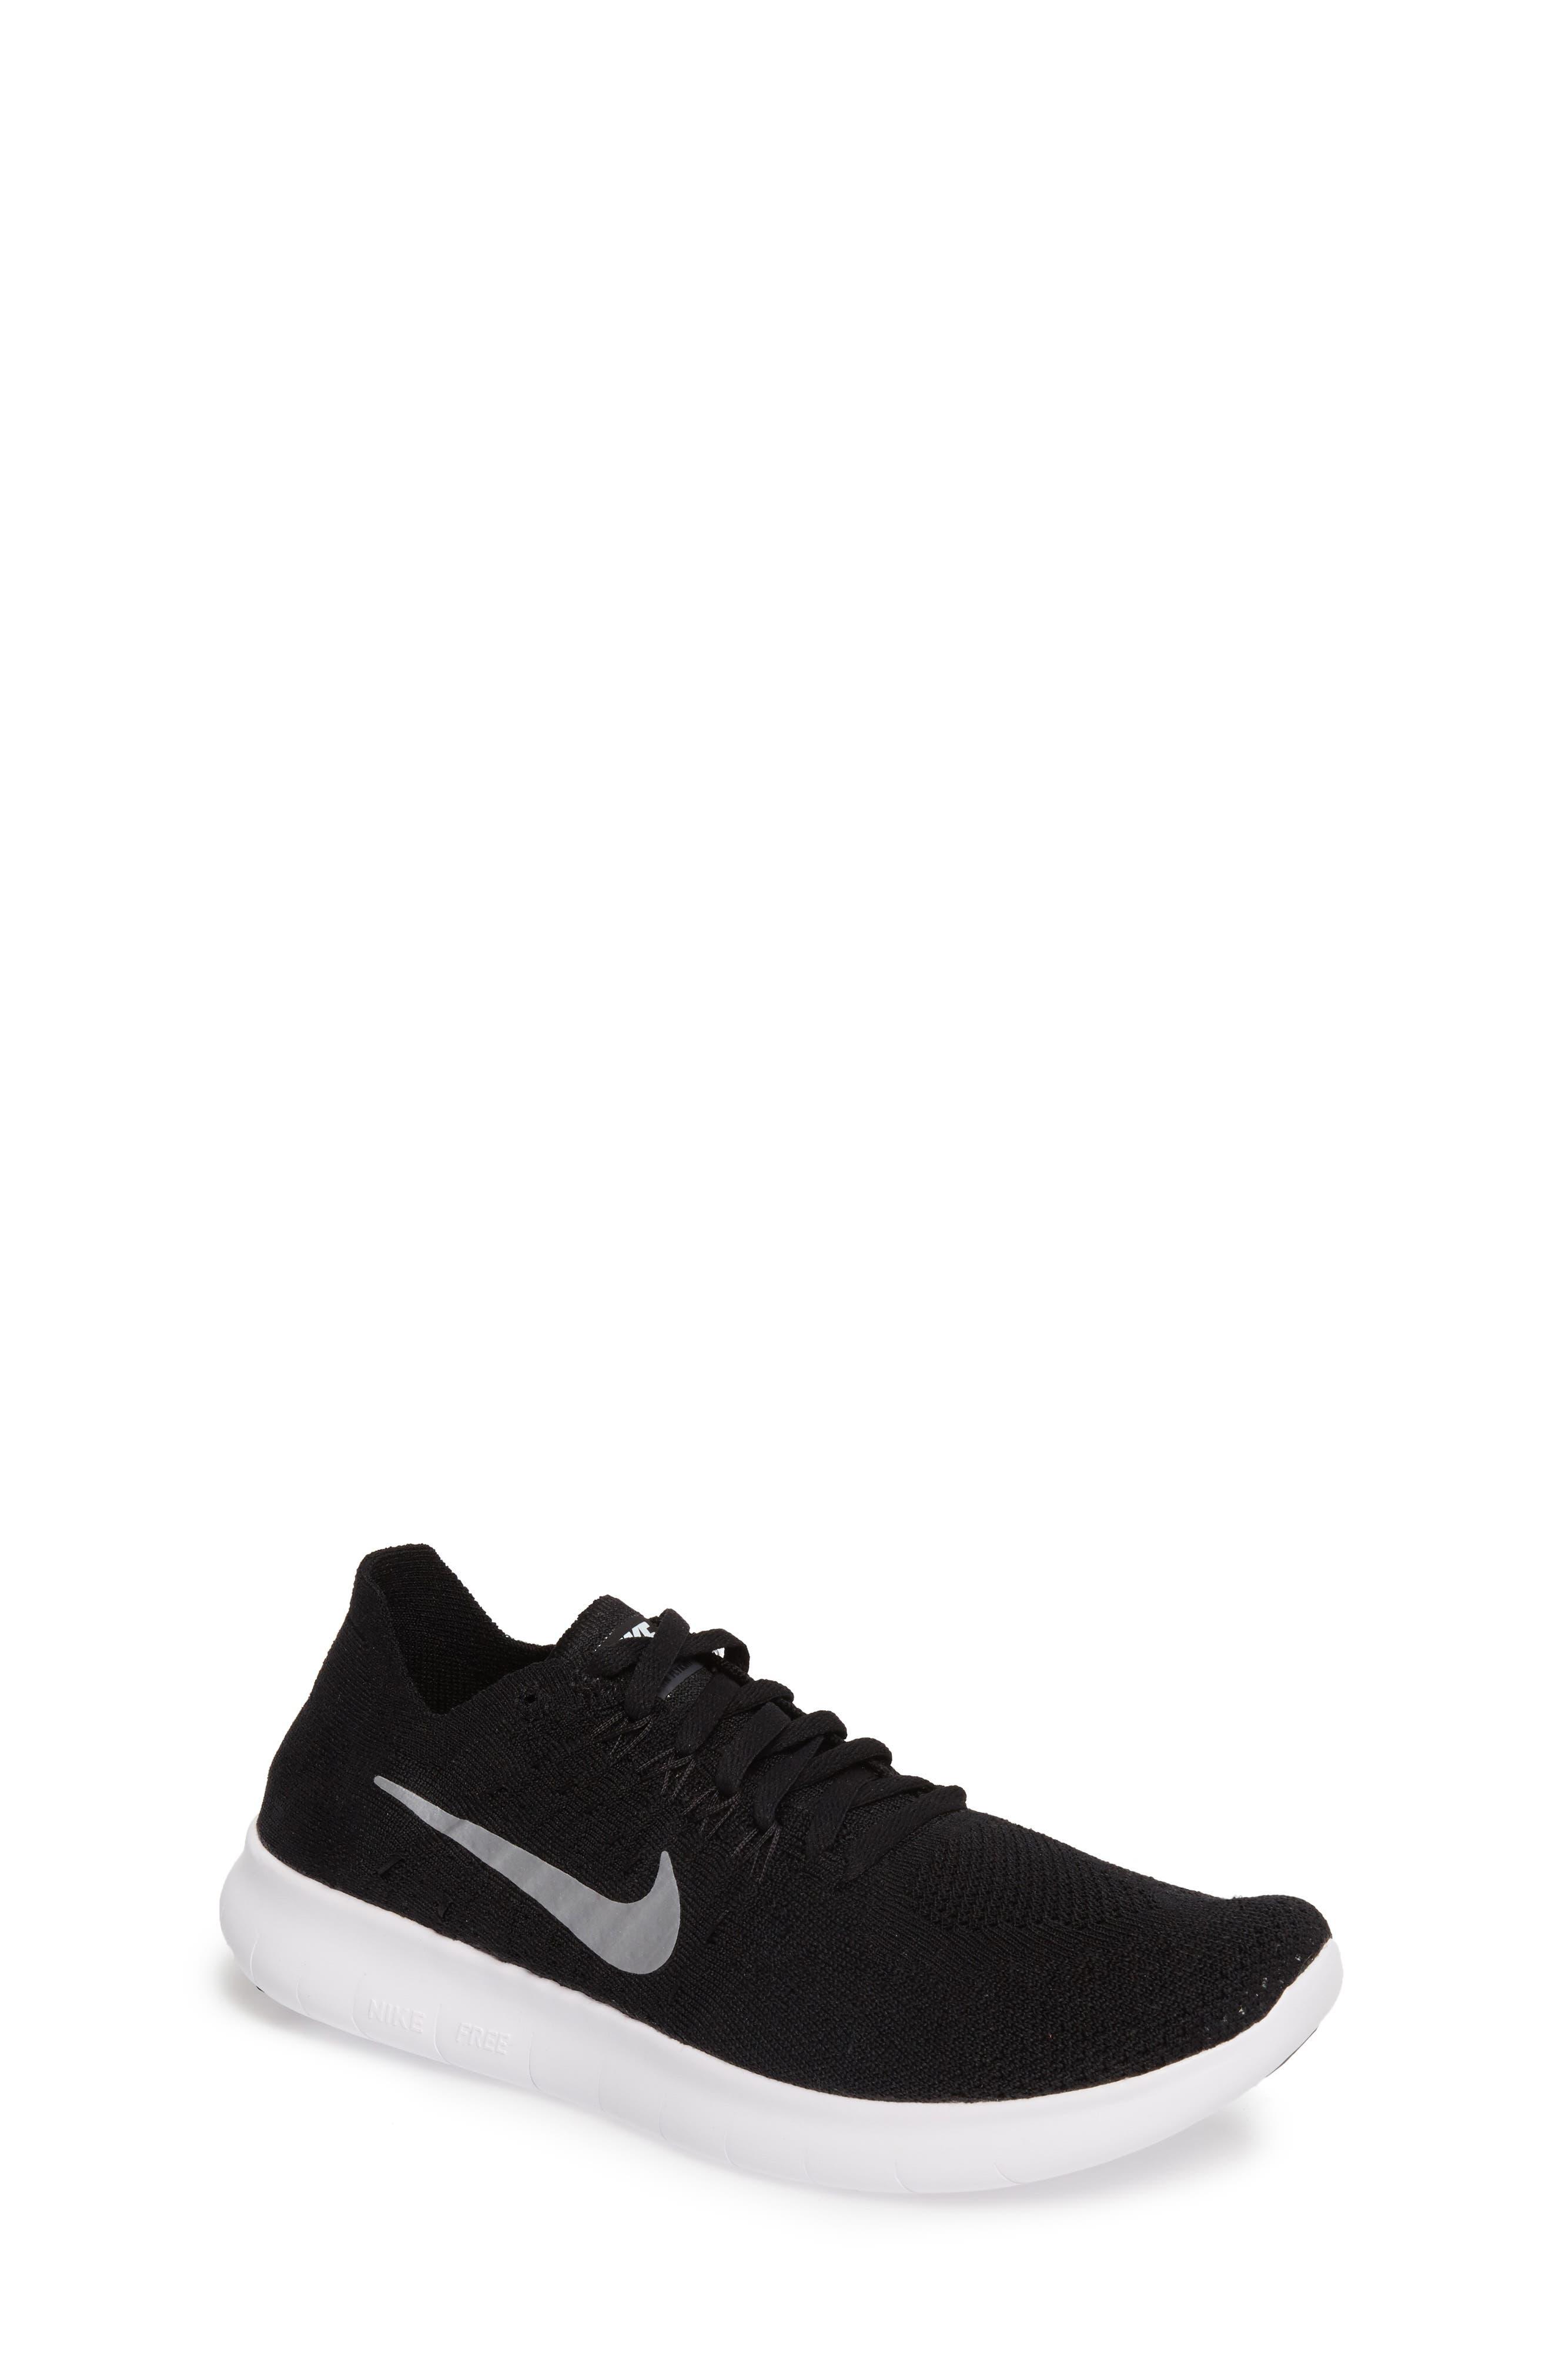 Nike Free RN Flyknit 2017 Running Shoe (Big Kid)